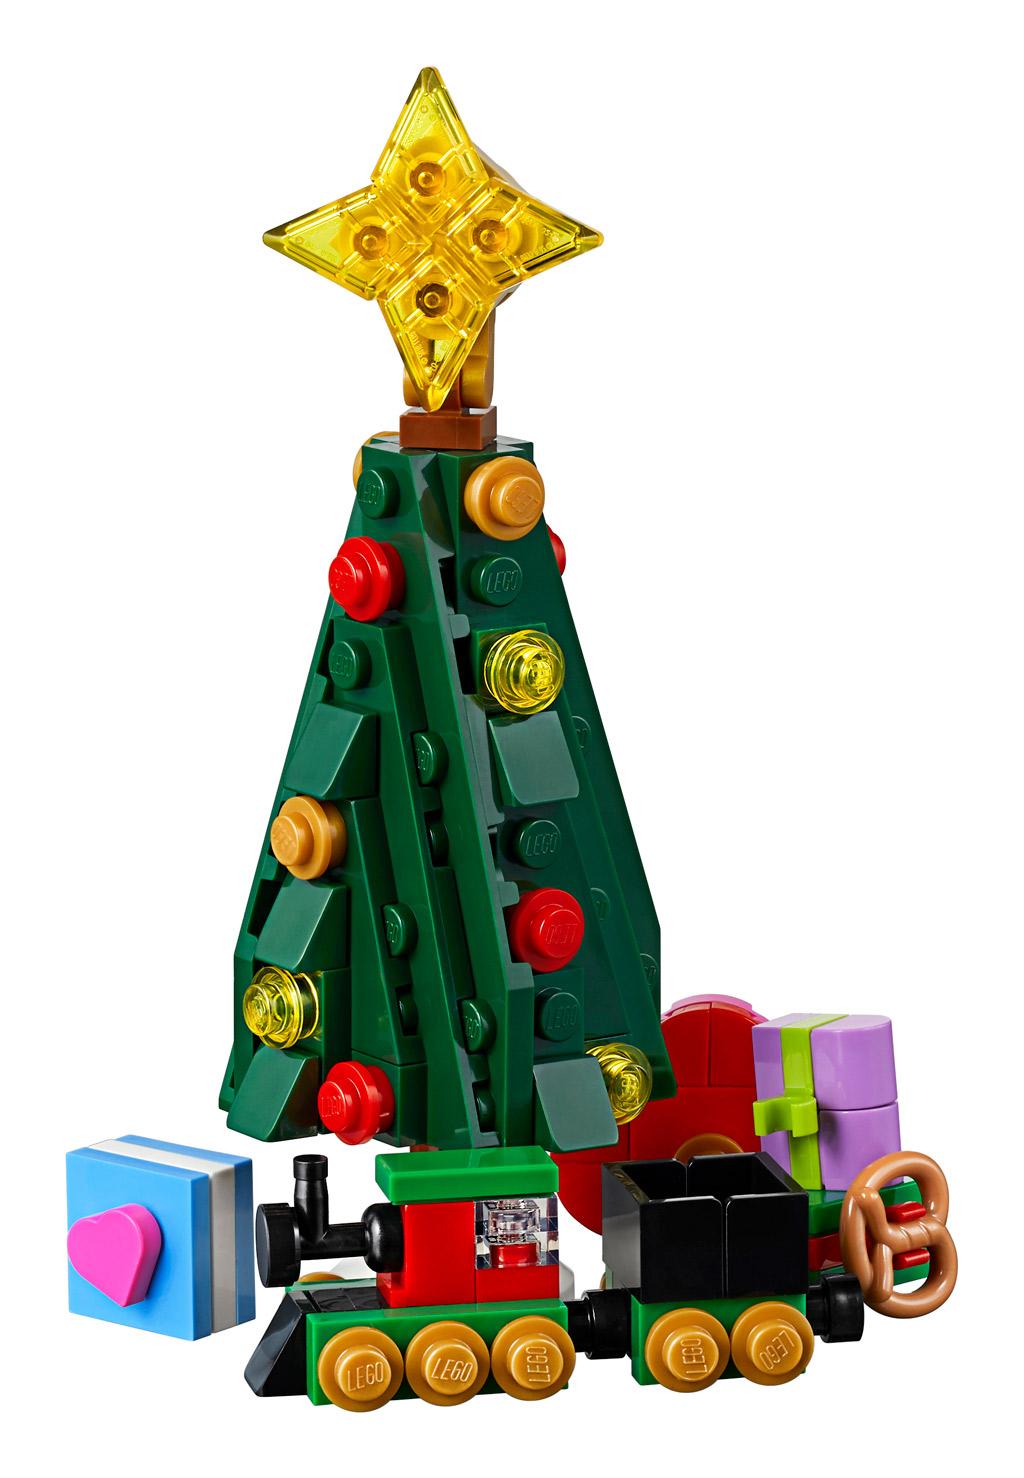 lego-creator-expert-10267-lebkuchenhaus-gingerbread-house-2019-weihnachtsbaum zusammengebaut.com